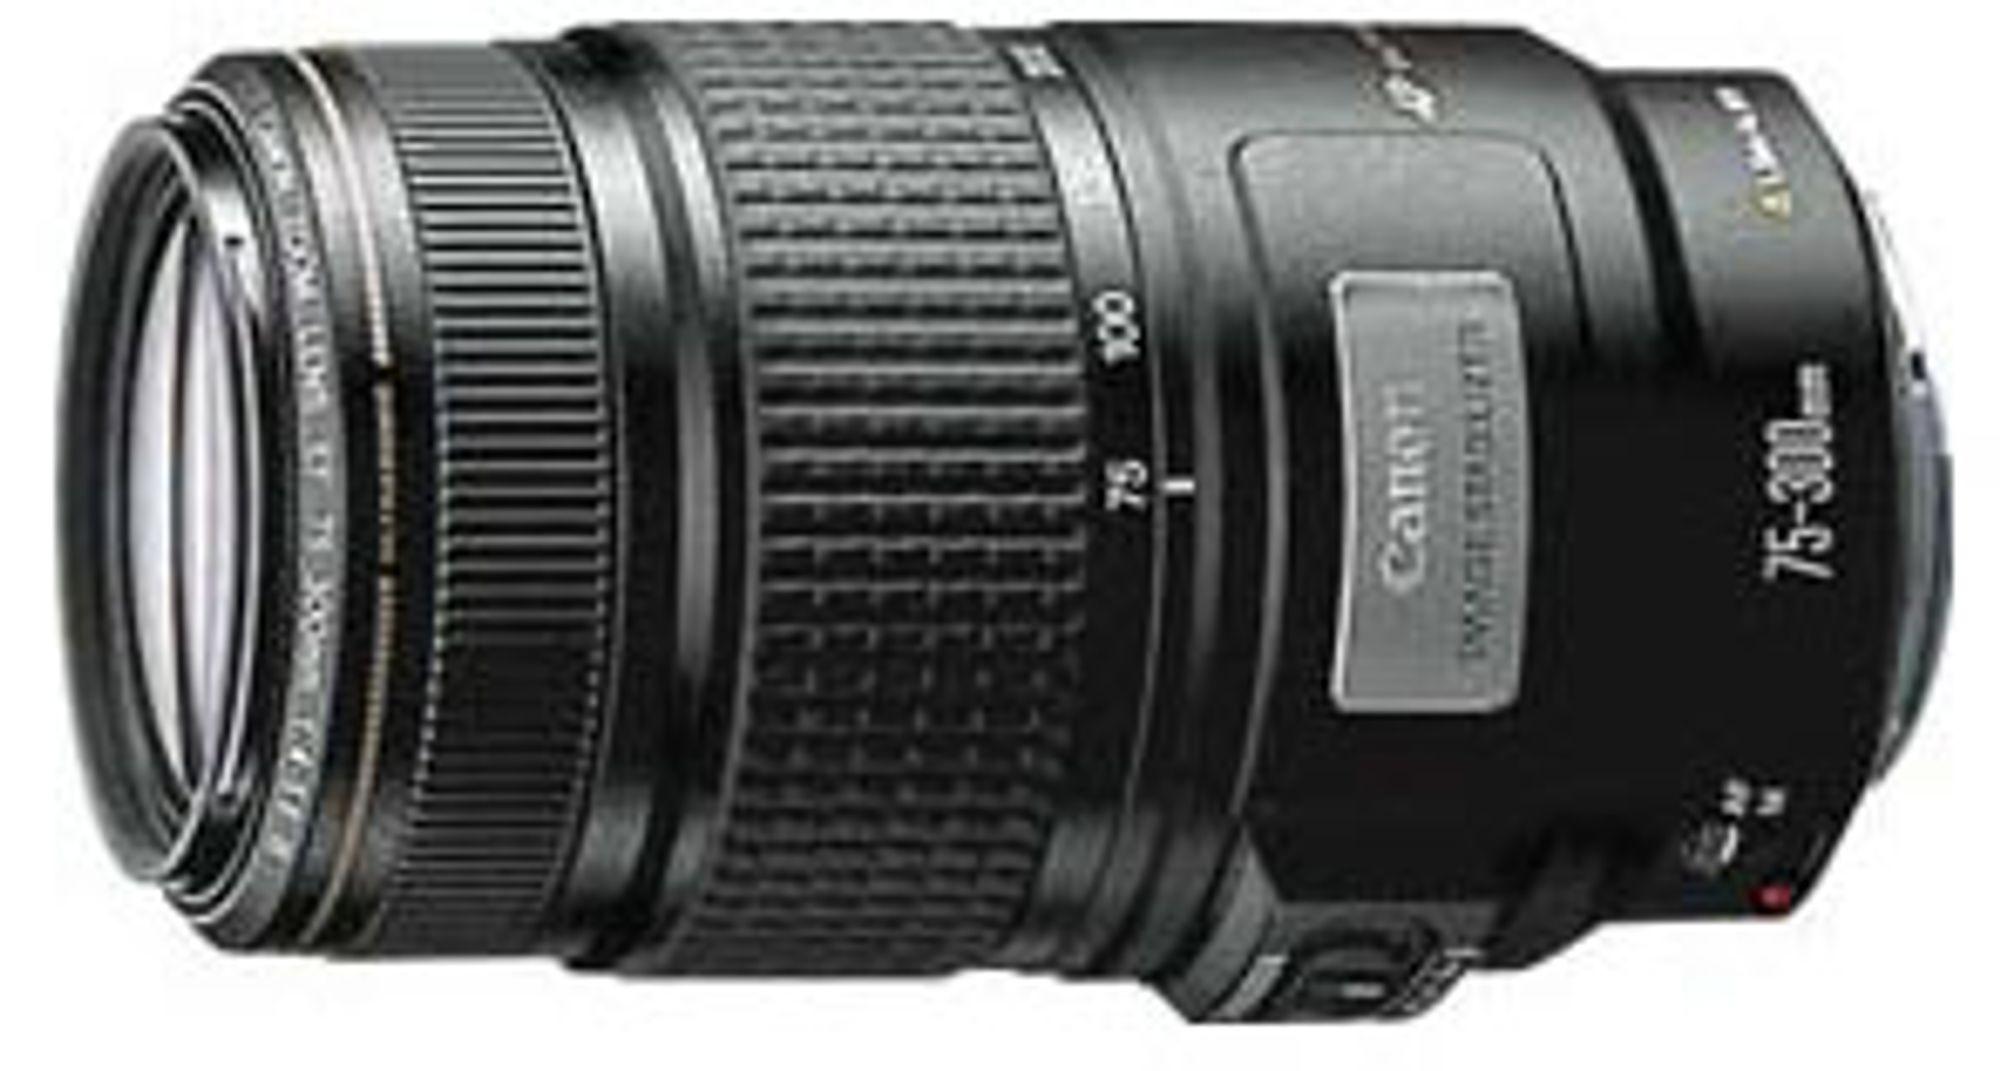 Det første objektivet med bildestabilisator: Canon EF 75-30mm f/3.5-5.6 IS USM